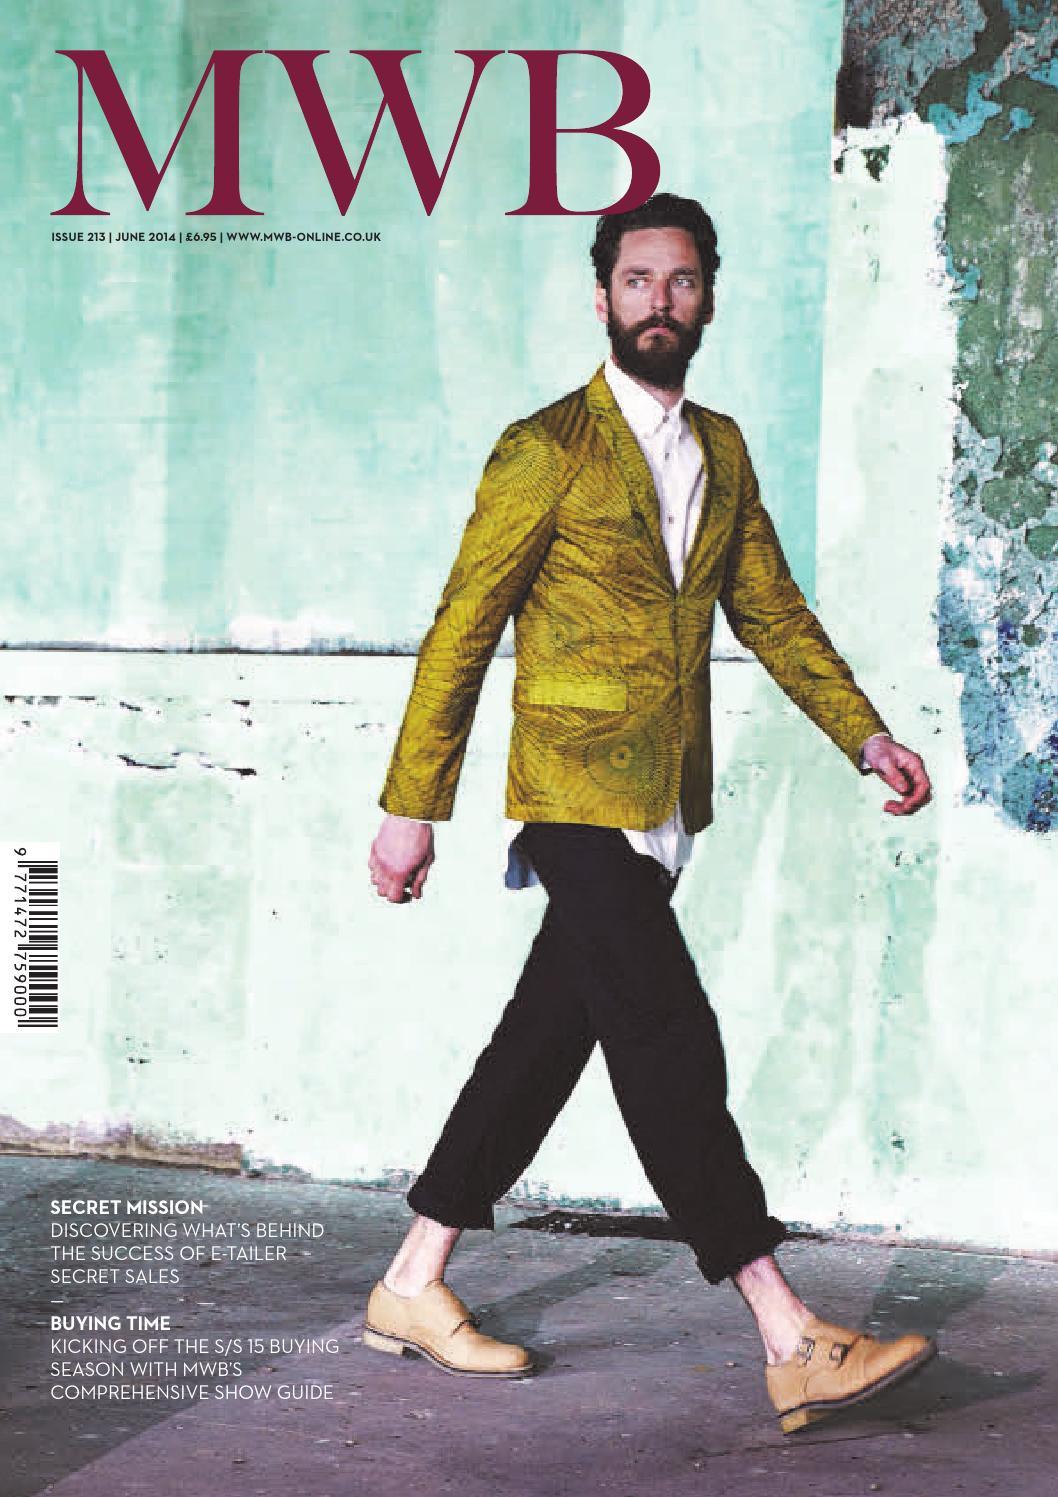 new concept e85ef 1edde MWB MAGAZINE JUNE ISSUE 213 by fashion buyers Ltd - issuu